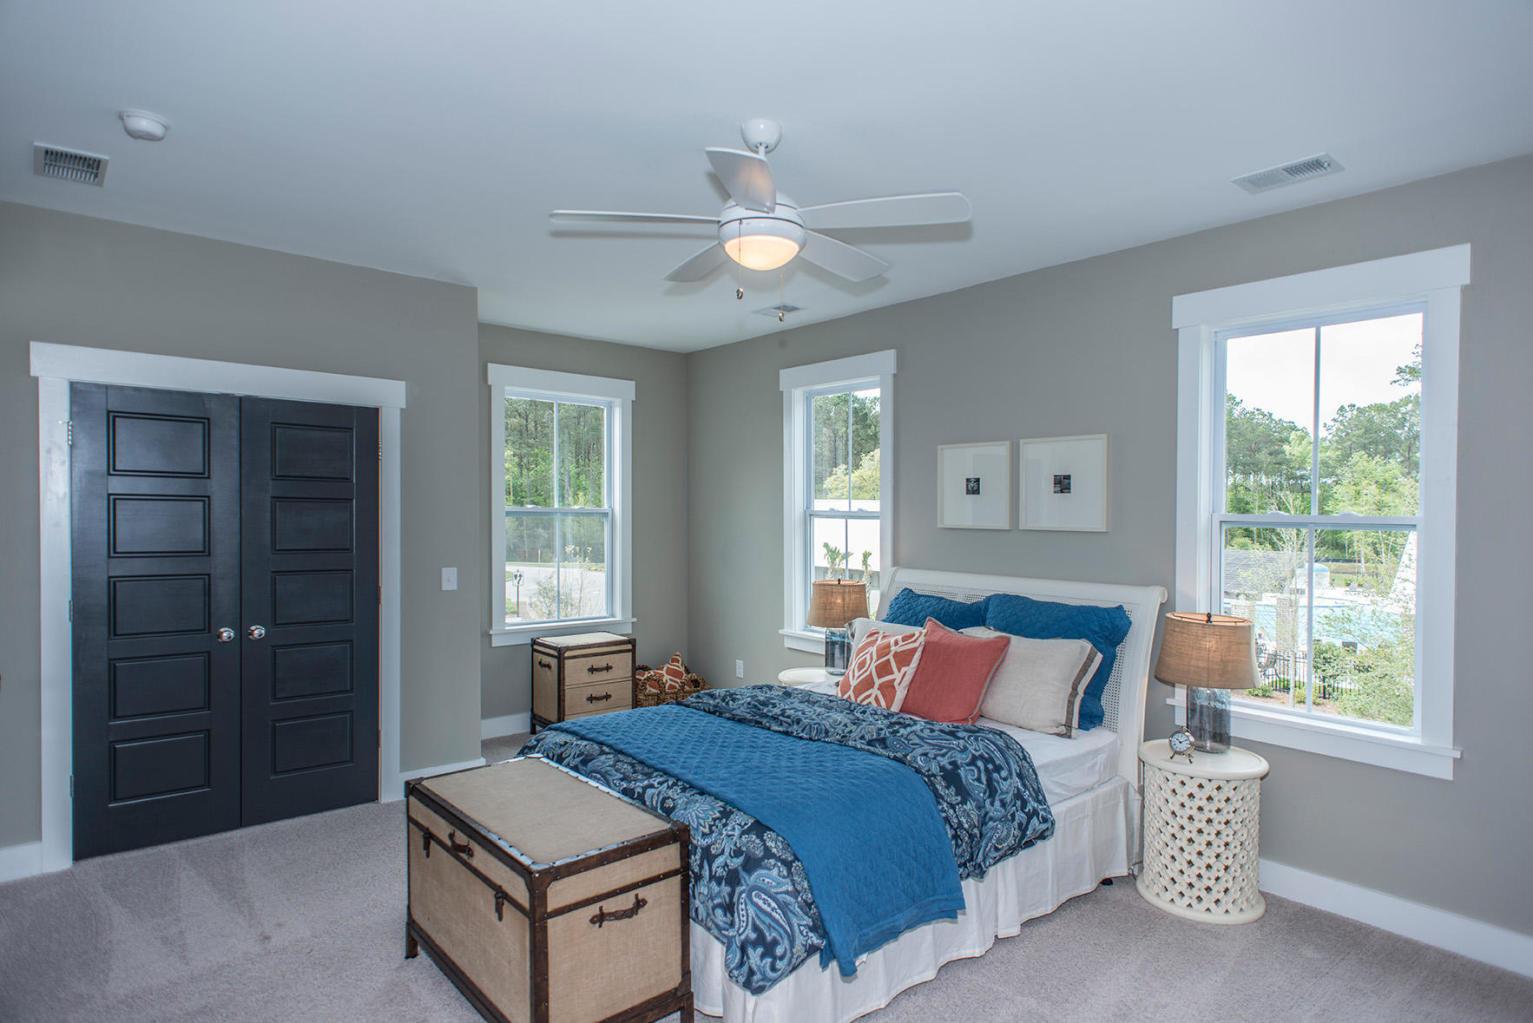 Carolina Park Homes For Sale - 1534 Banning, Mount Pleasant, SC - 6